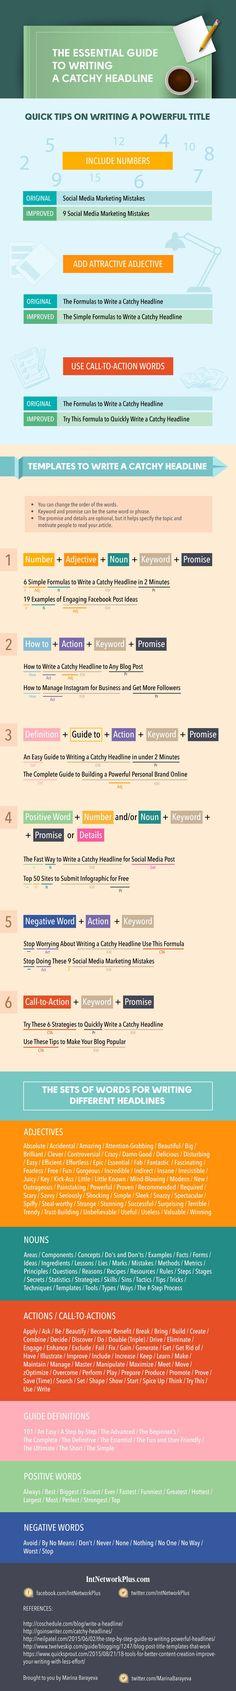 How to Write Better Headlines [Infographic], via @HubSpot